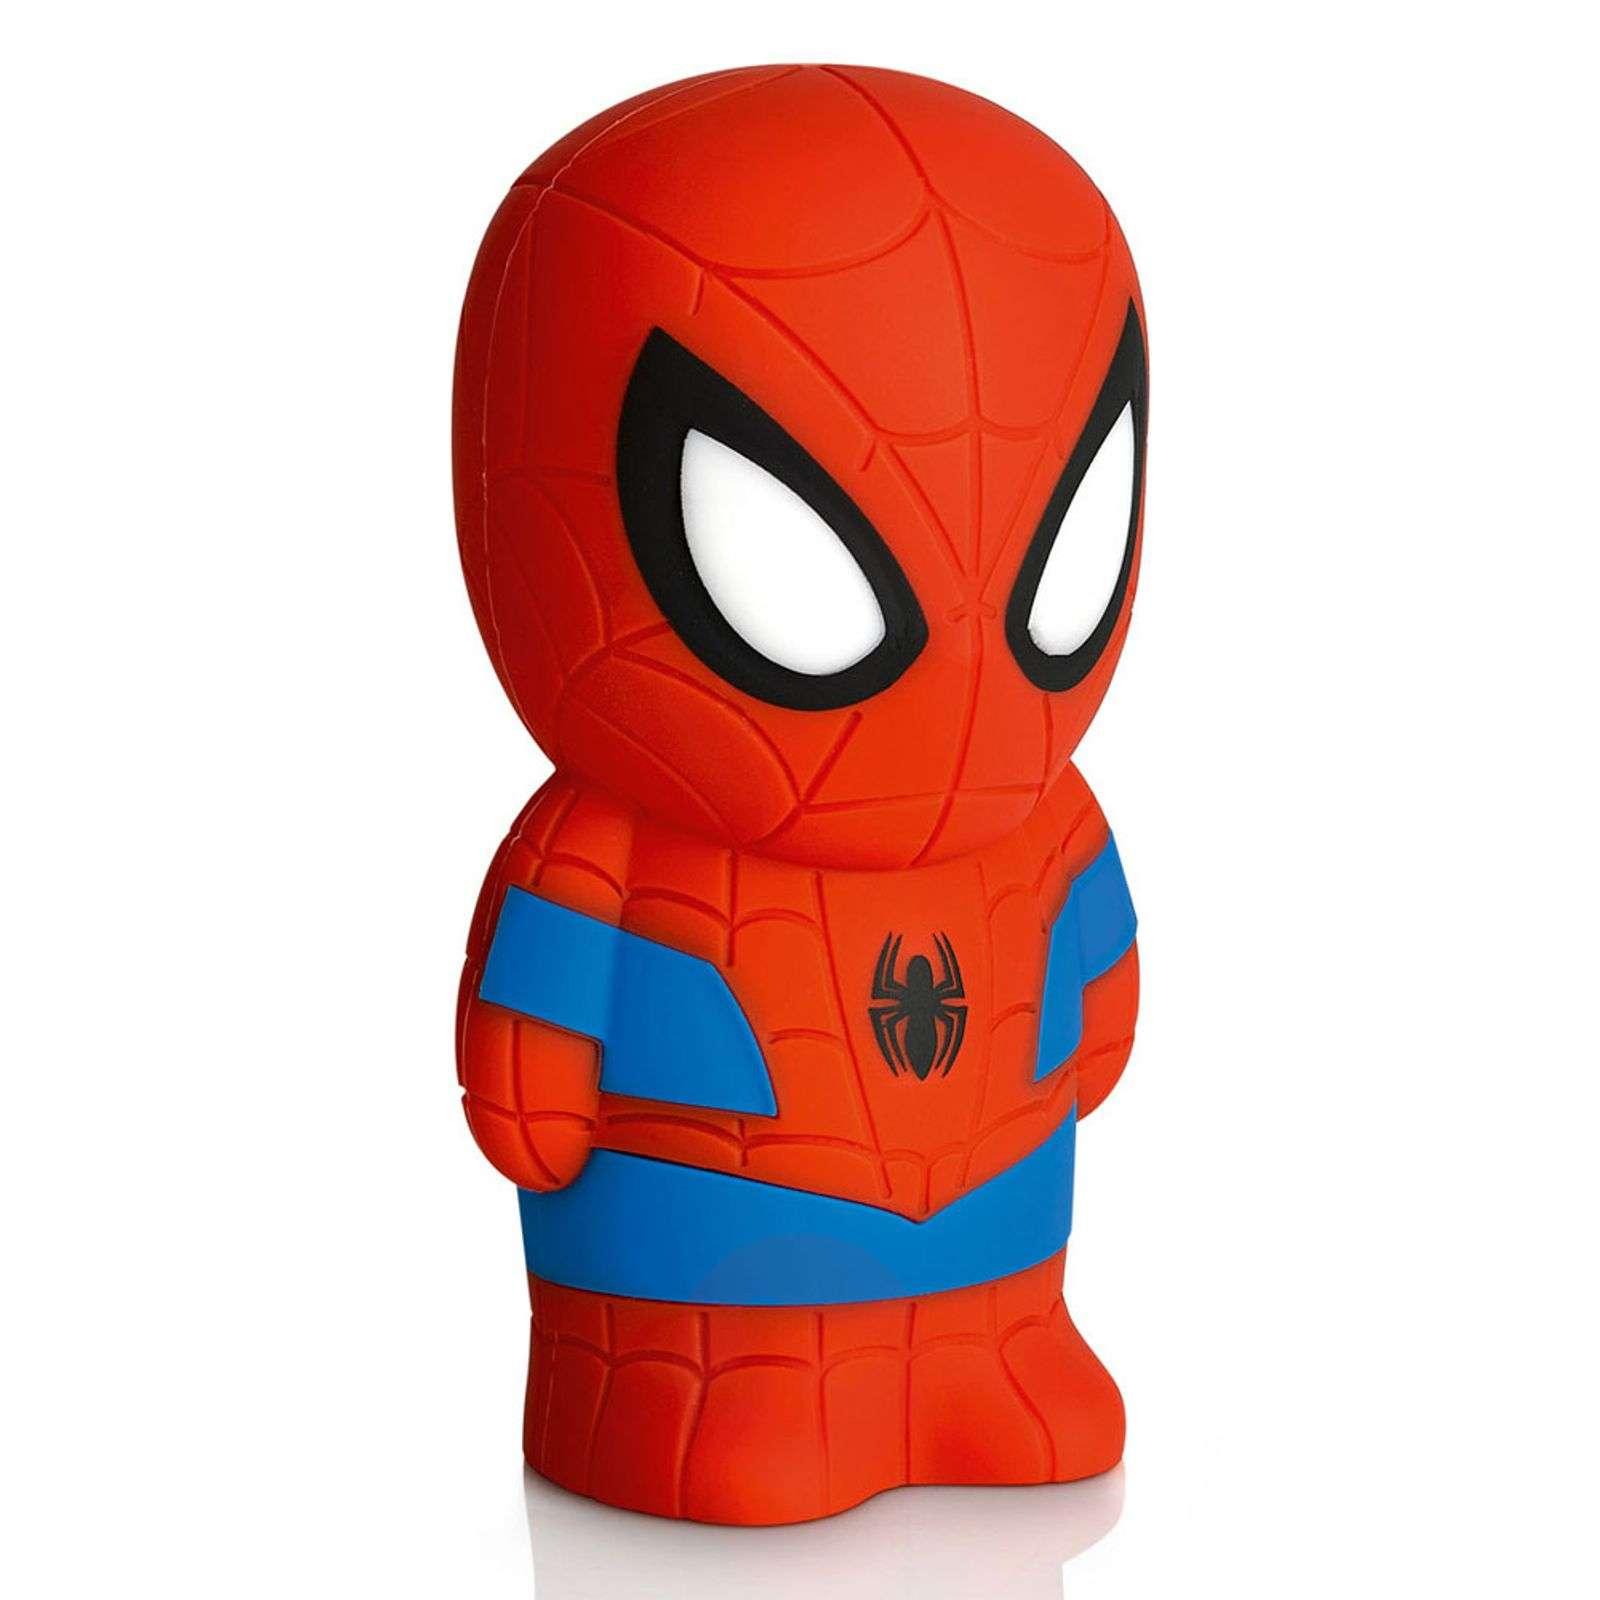 Spiderman LED night light-7531757-01